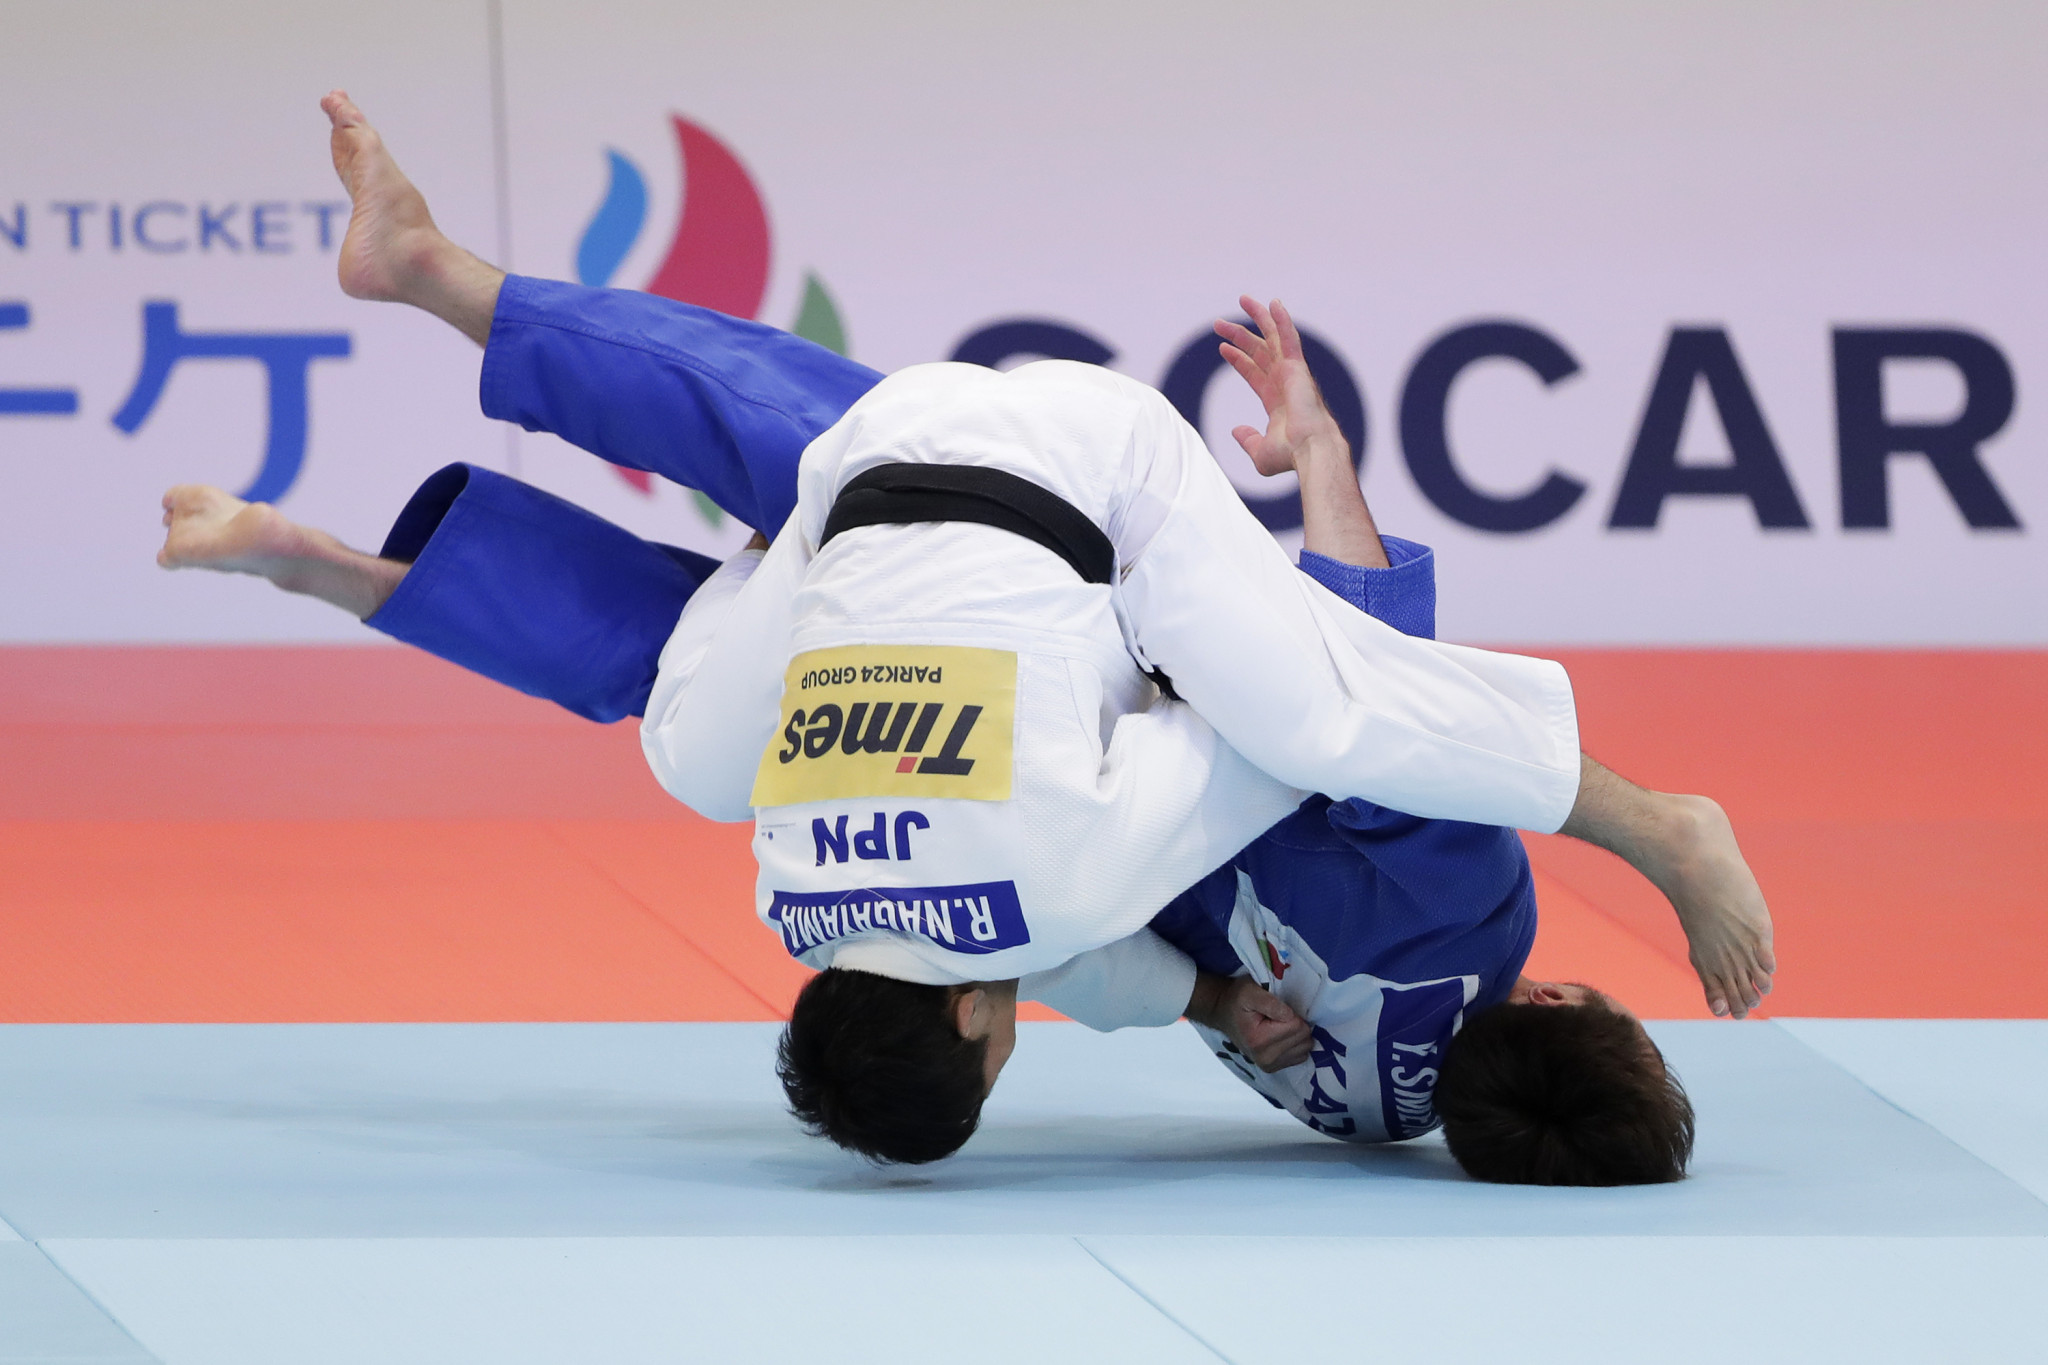 Men's under-60 kilogram fourth seed Ryuju Nagayama, meanwhile, earned Japan a bronze medal ©Getty Images